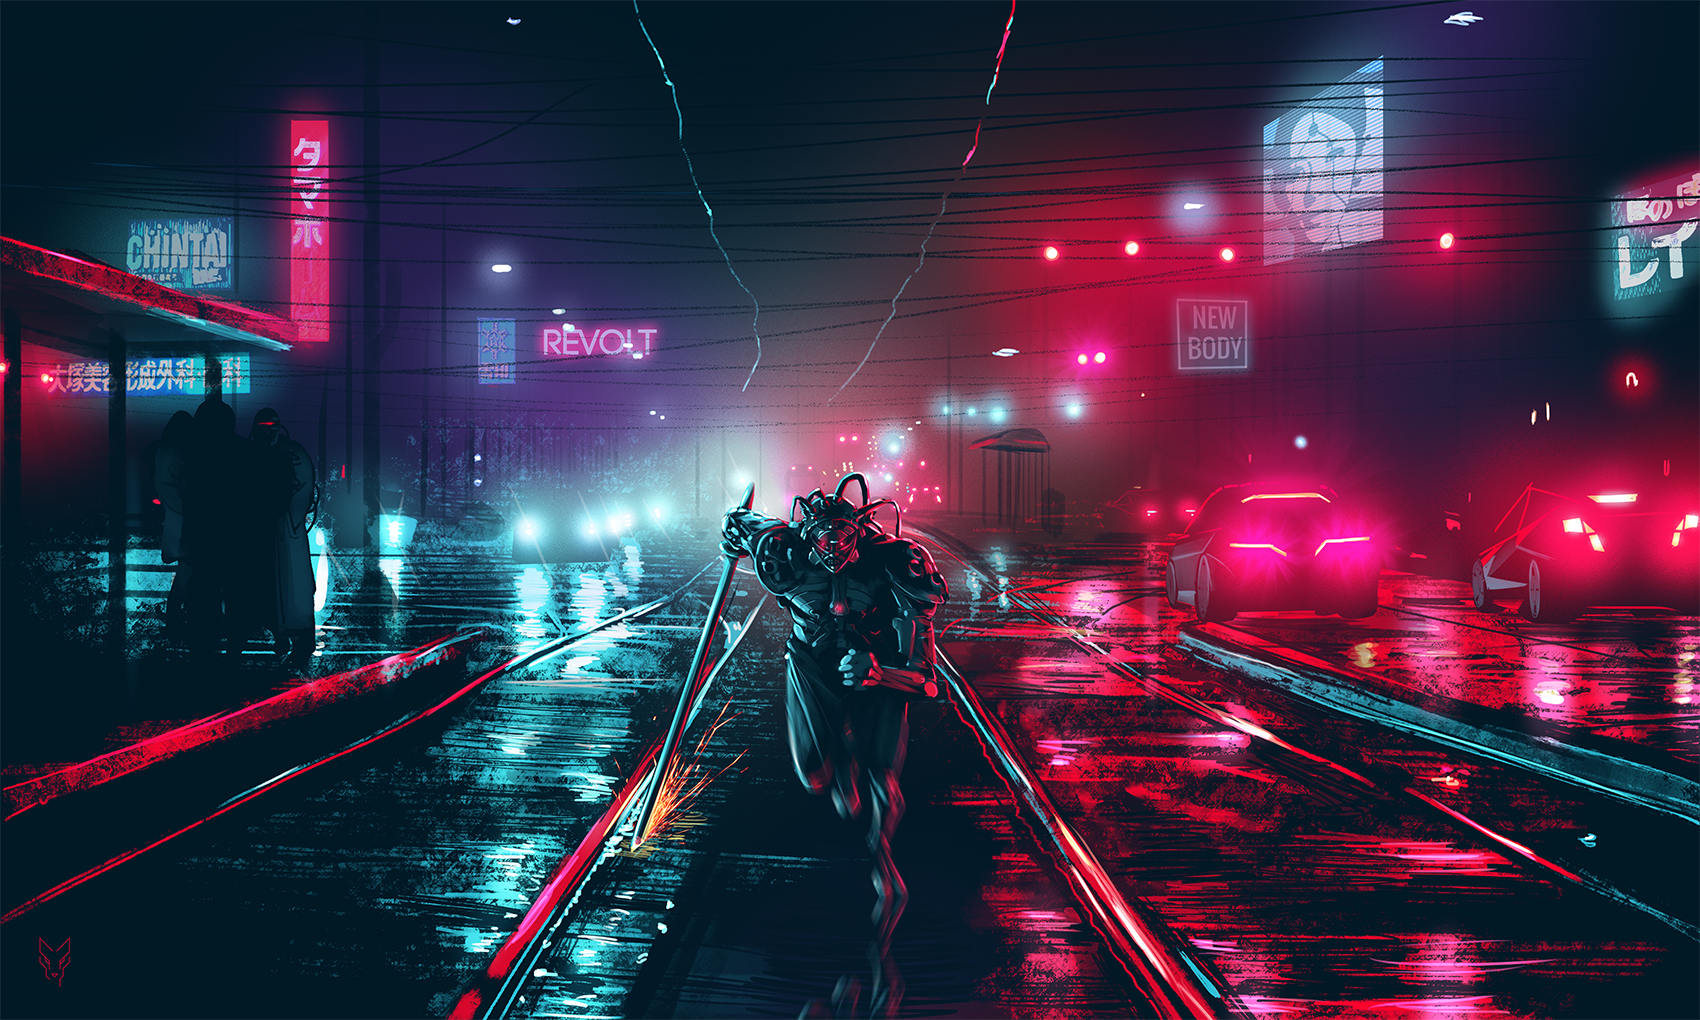 General 1700x1020 Dark Cyberpunk cityscape cyberpunk night dark lights futuristic